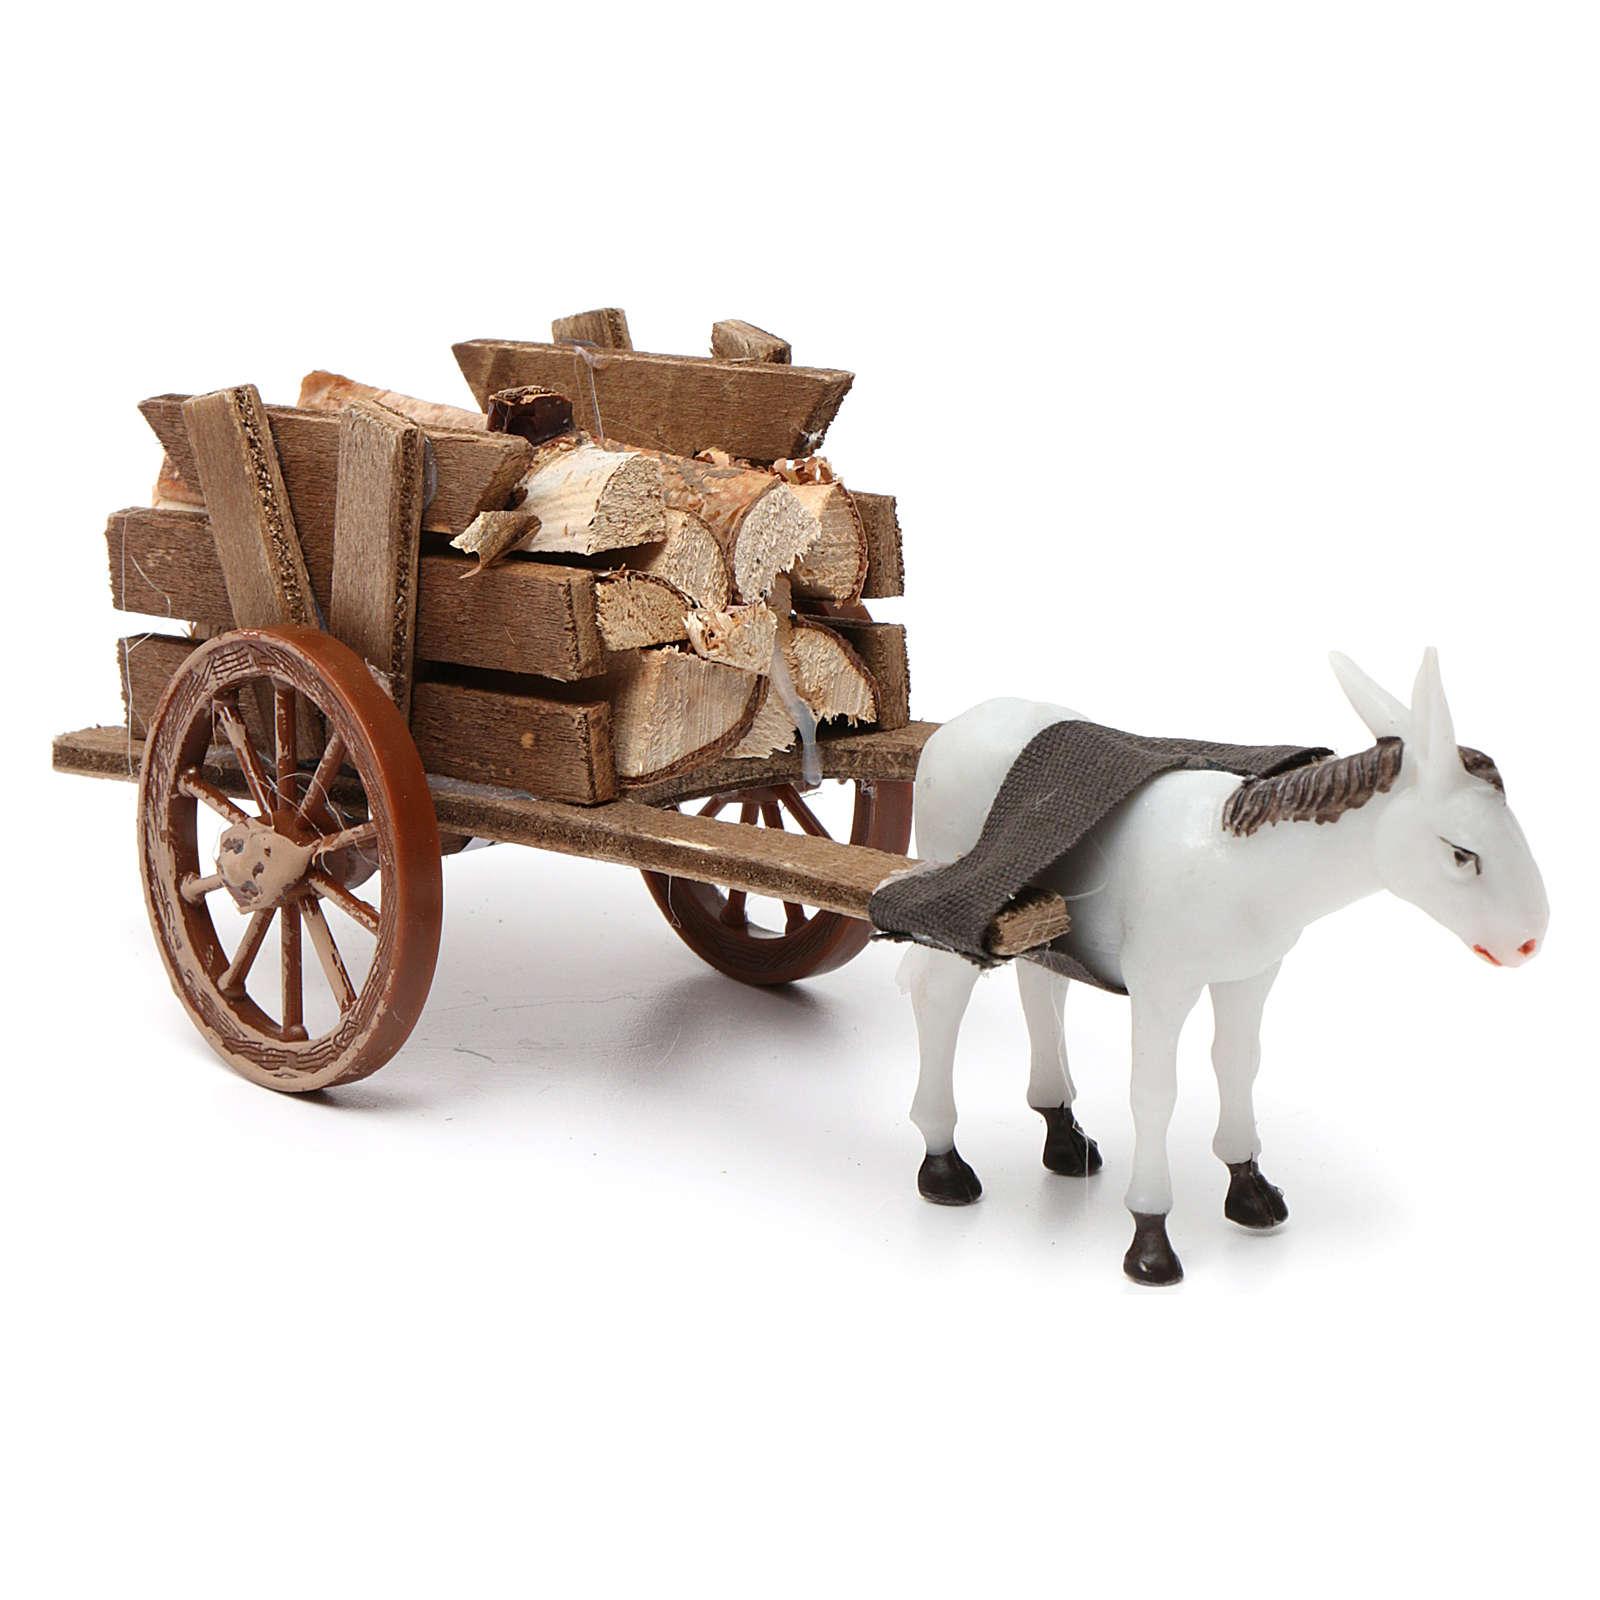 Donkey pulling a cart full of wood for Nativity Scene 10x20x10 3